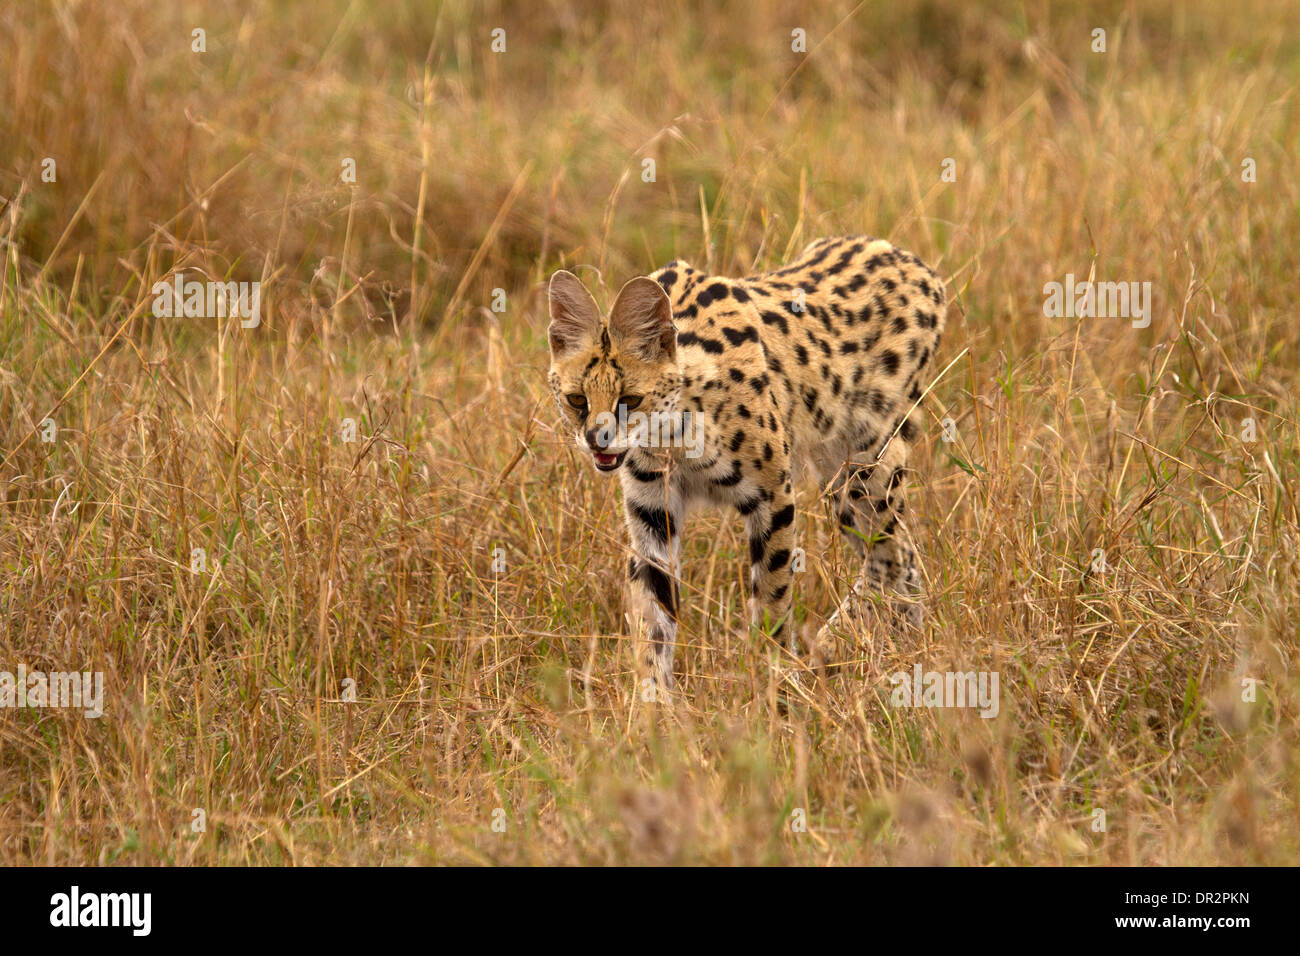 Serval cat, Leptailurus serval hunting - Stock Image